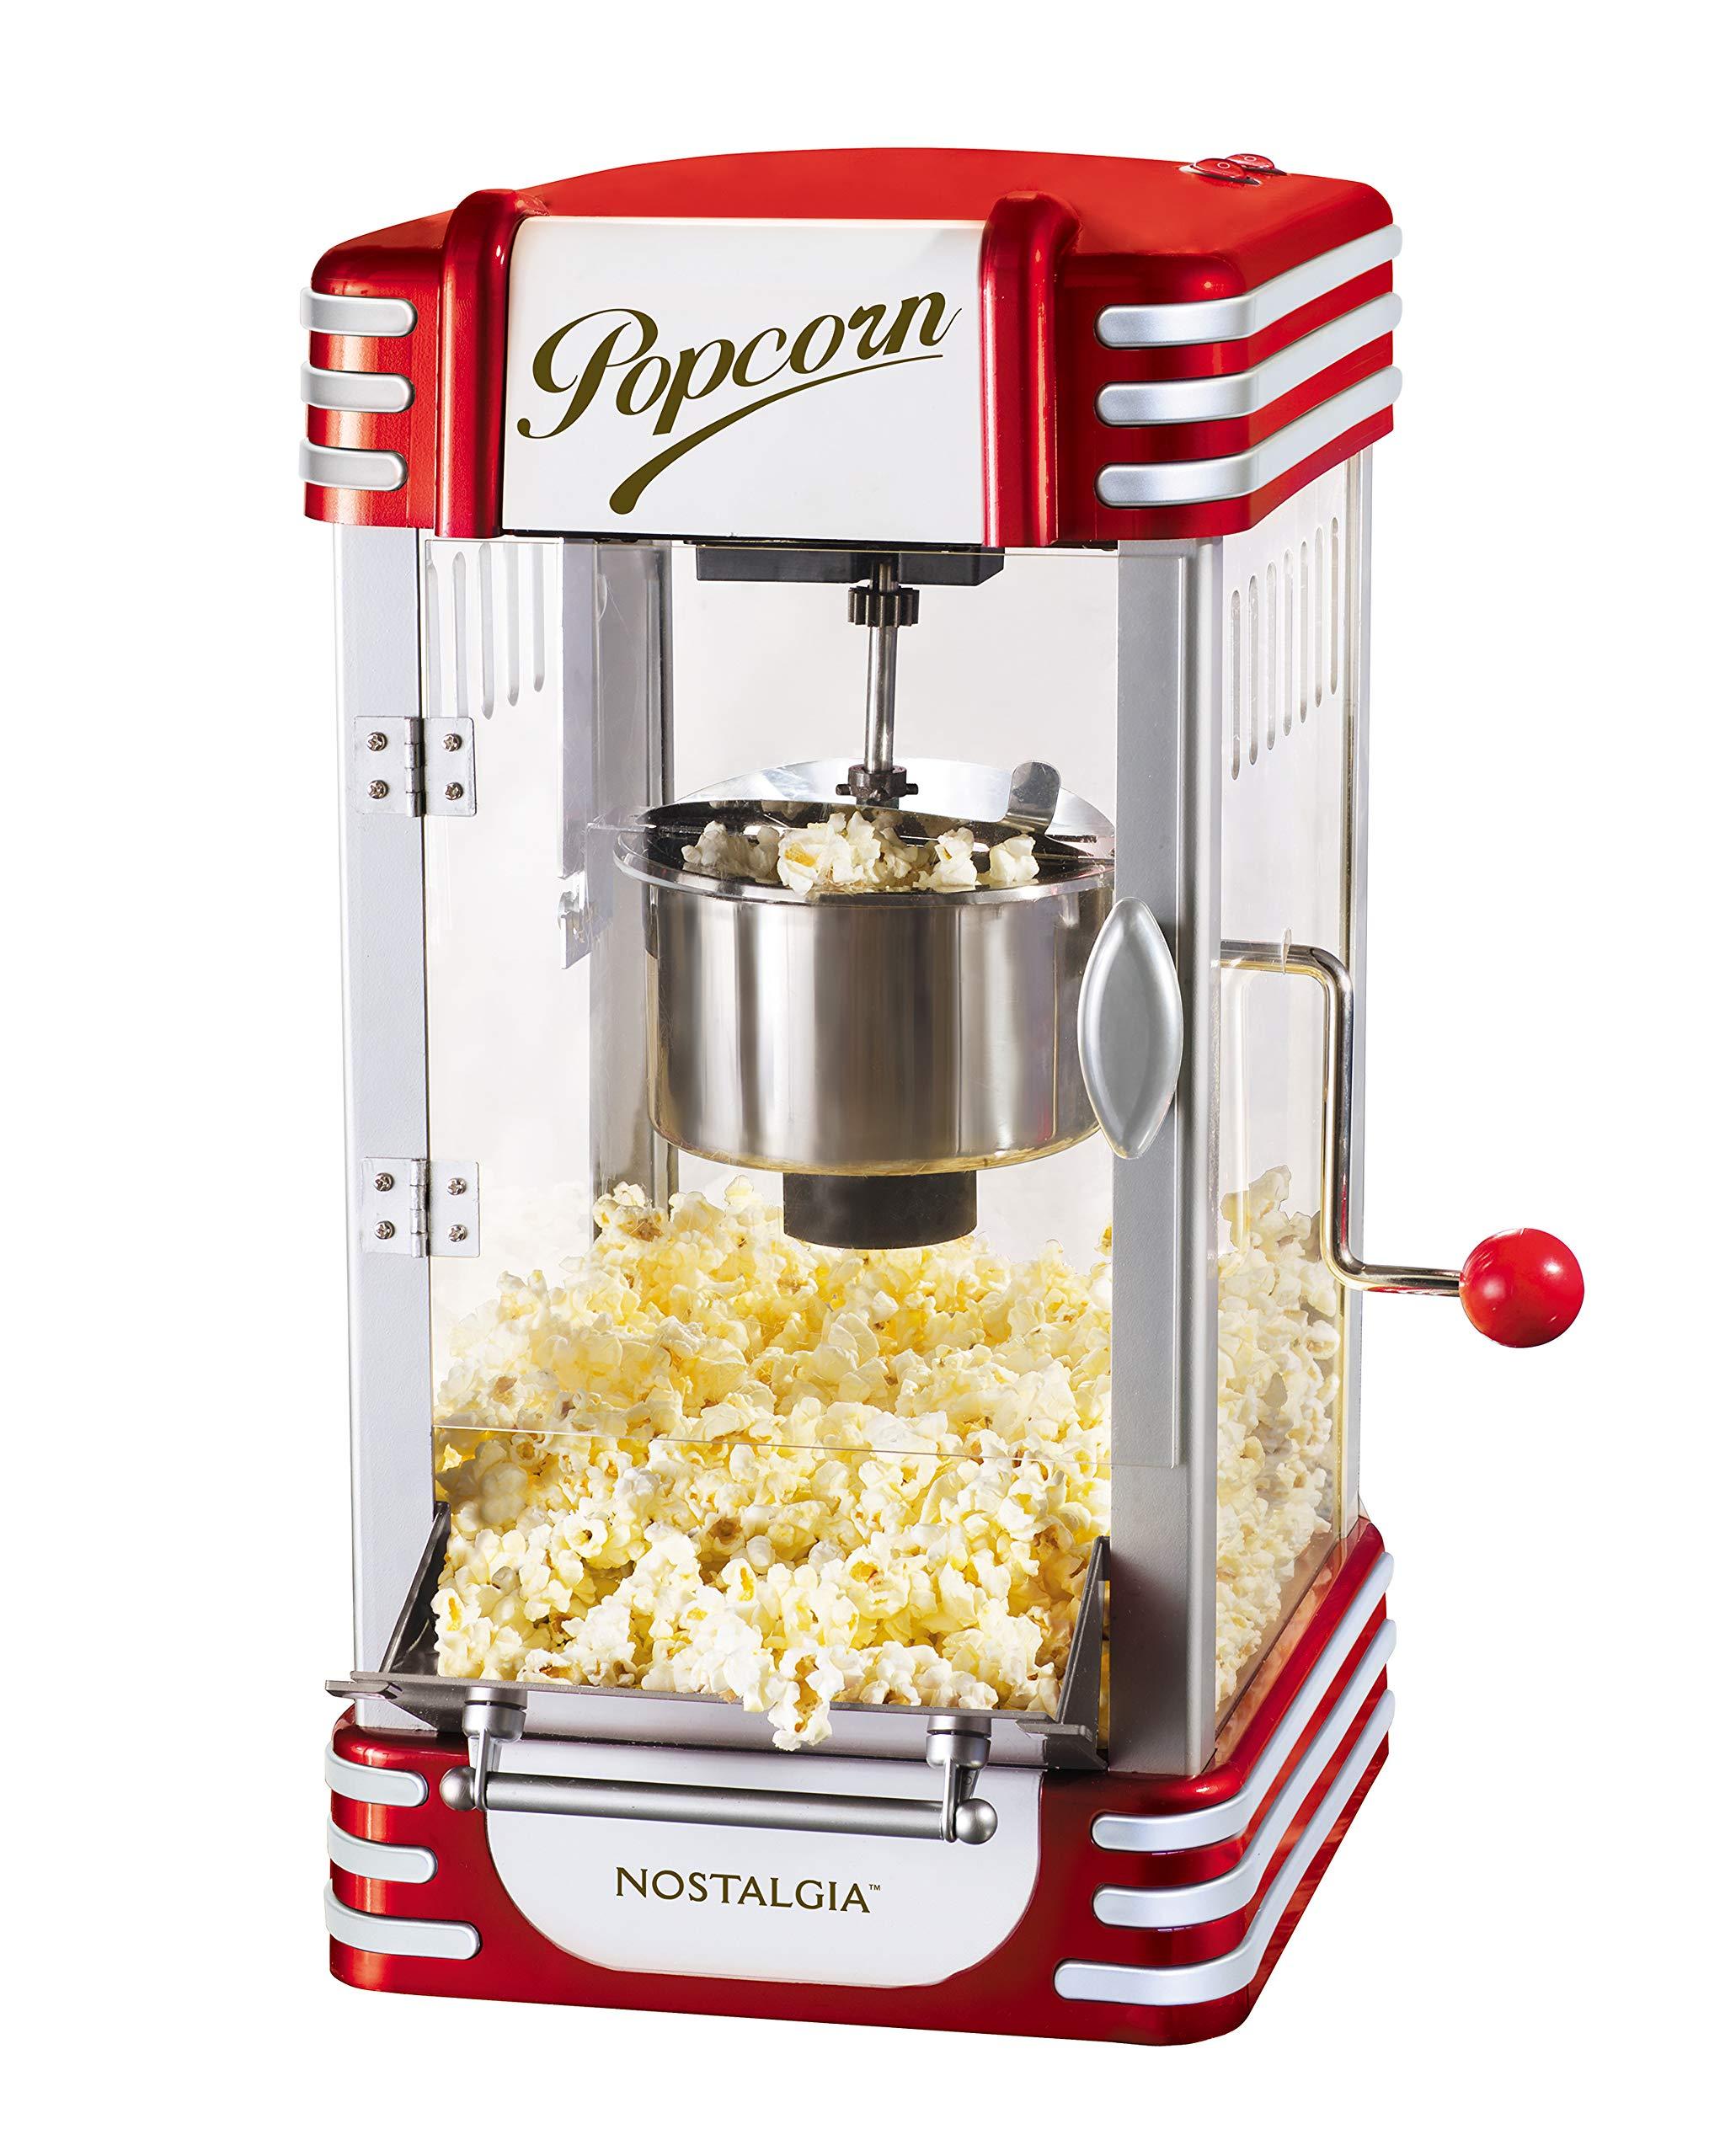 Nostalgia RKP630 Retro 2.5-Ounce Kettle Popcorn Maker by NOSTALGIA